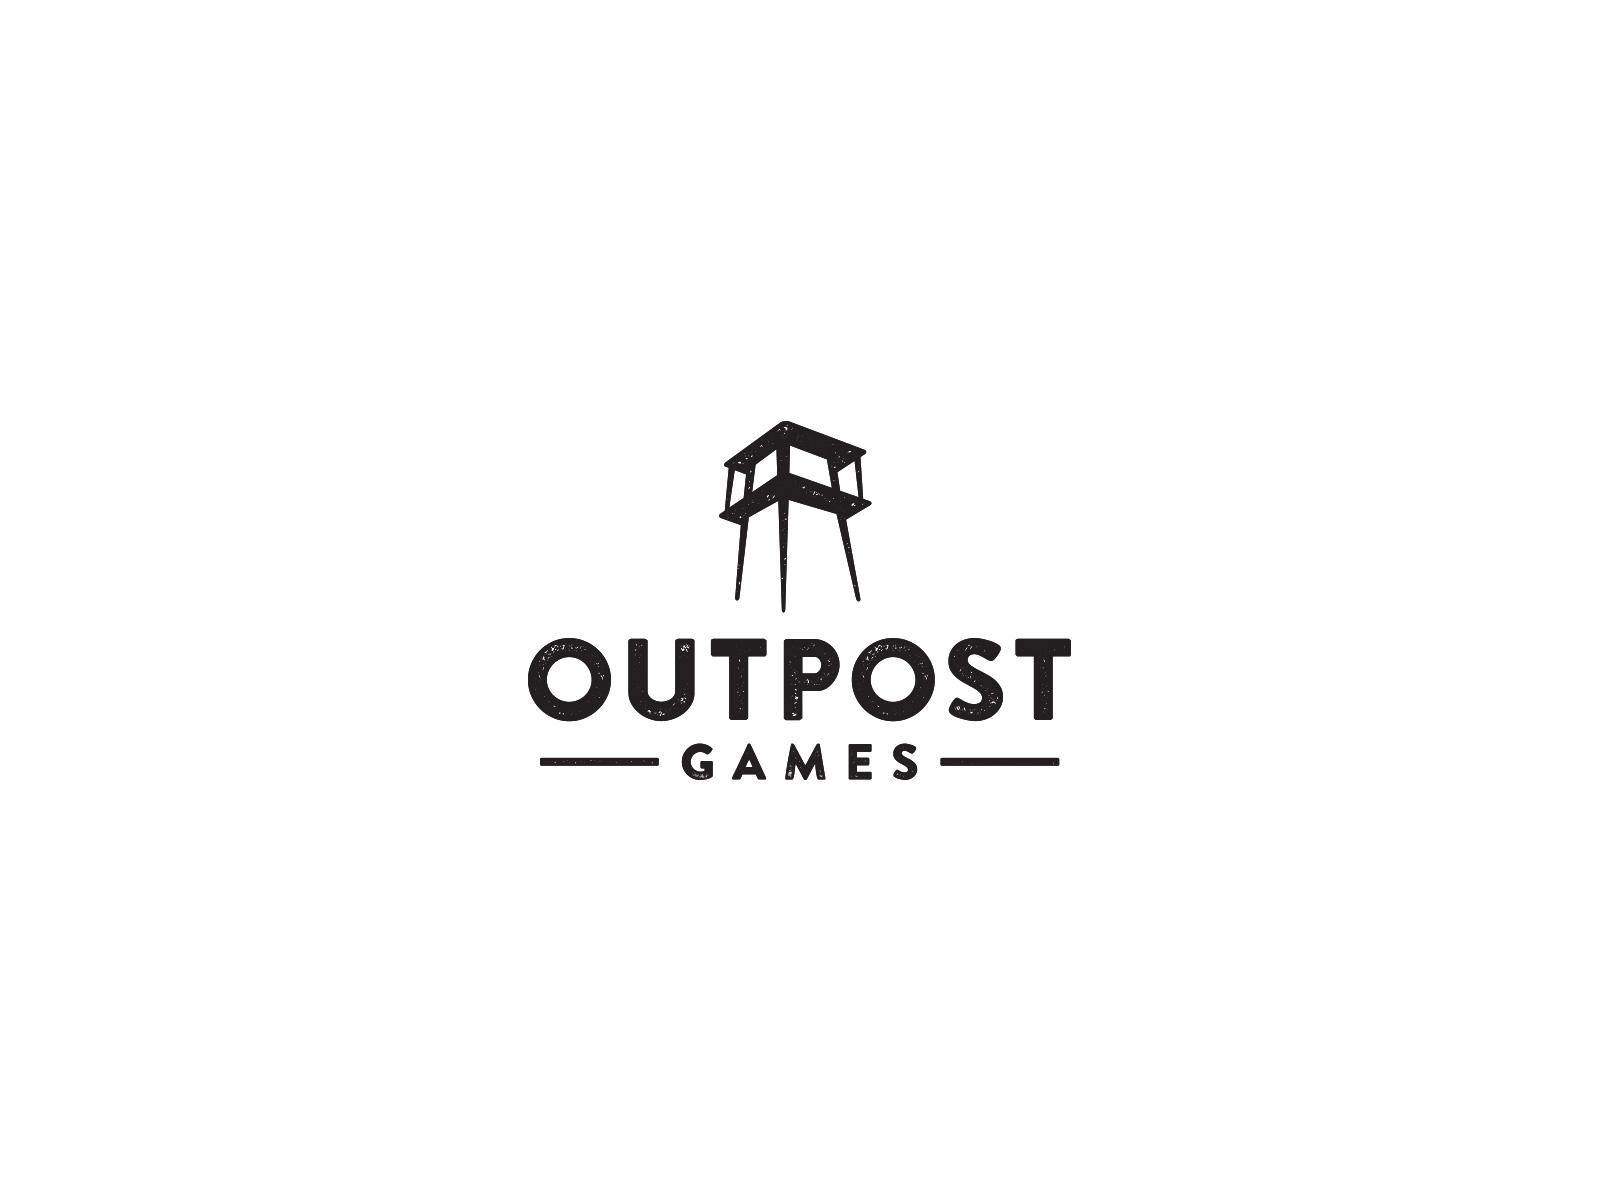 Outpost games logo design bw1